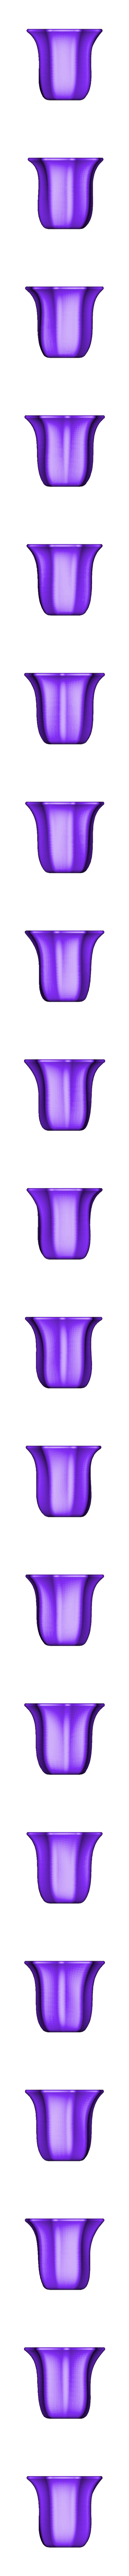 corolle.STL Download free STL file Fleurs • 3D print design, Etienne